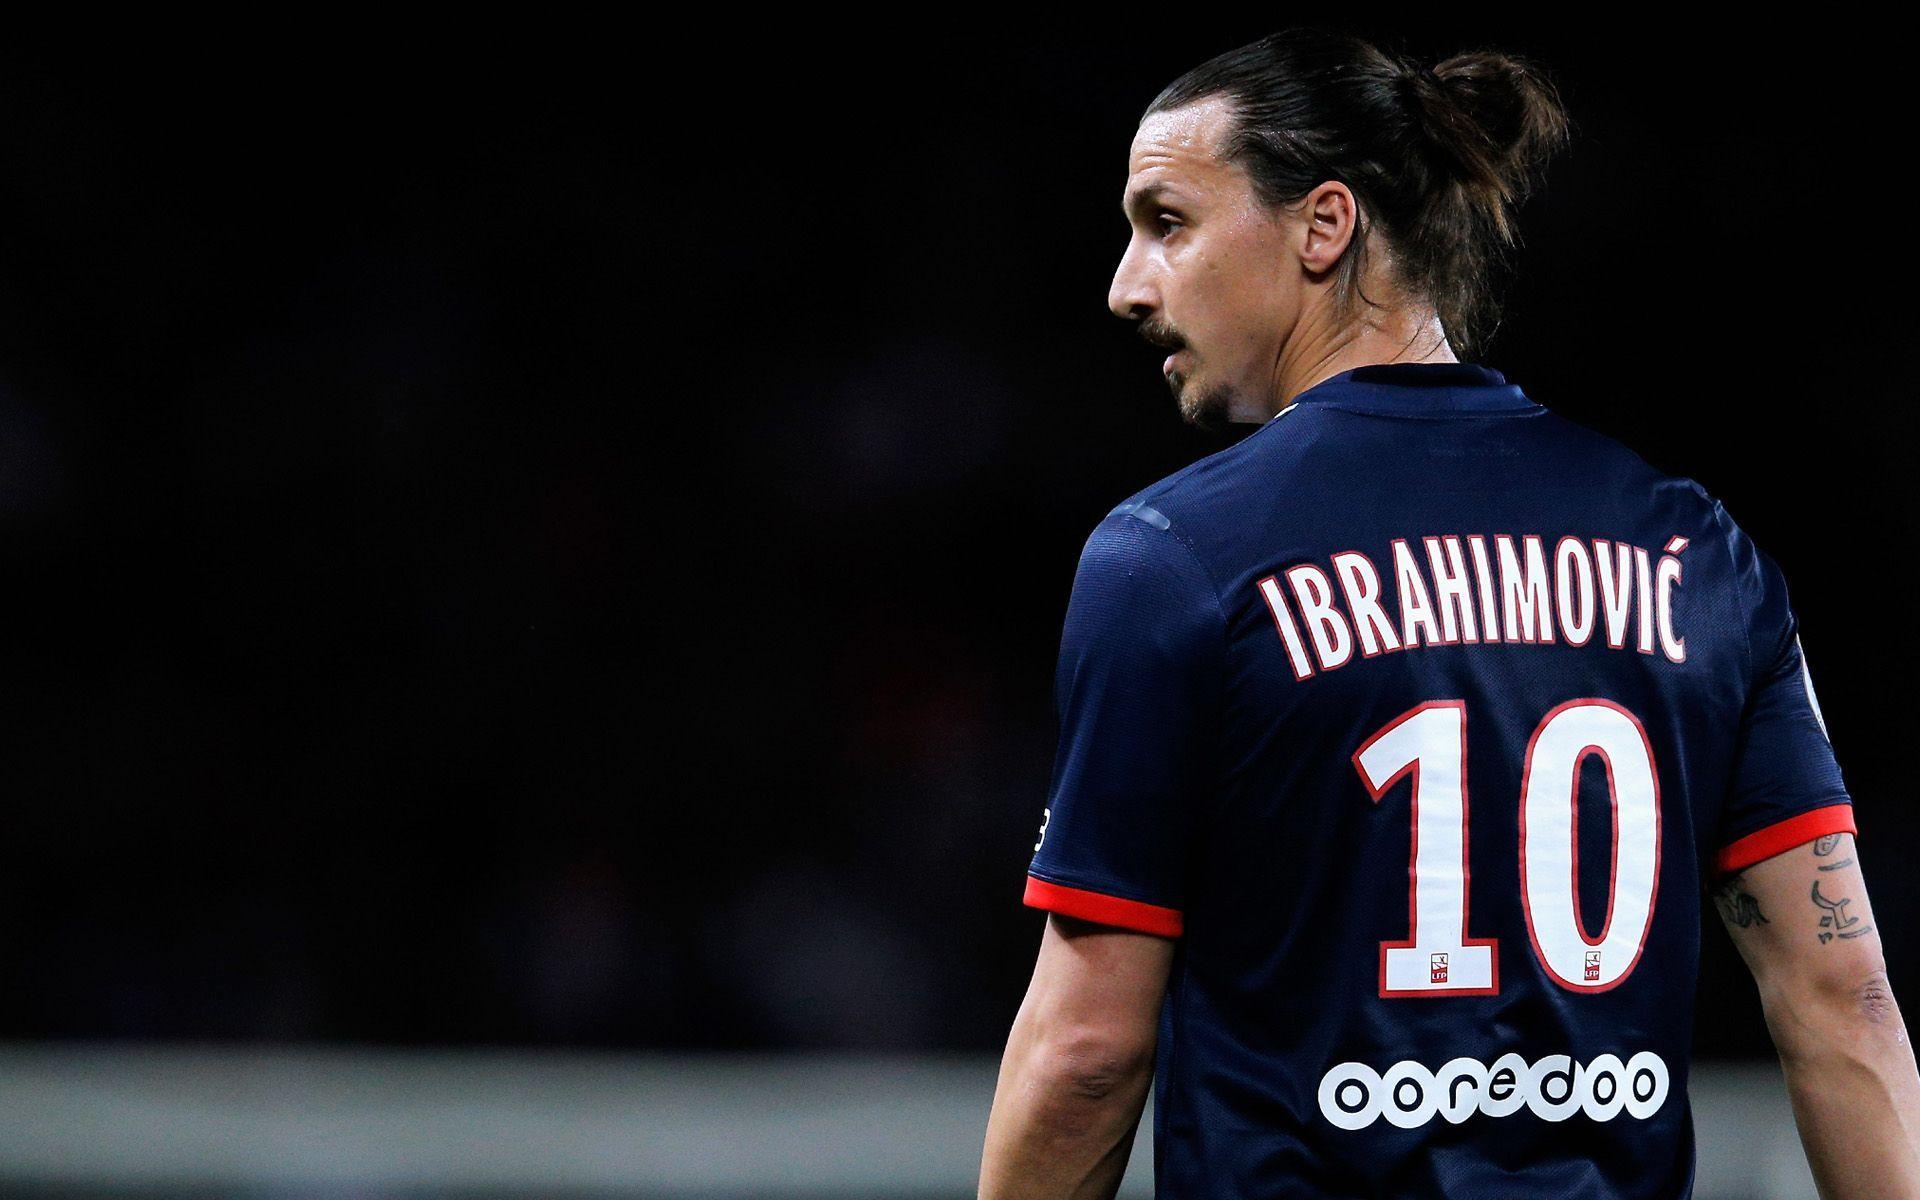 Ibrahimovic Diventare leggenda